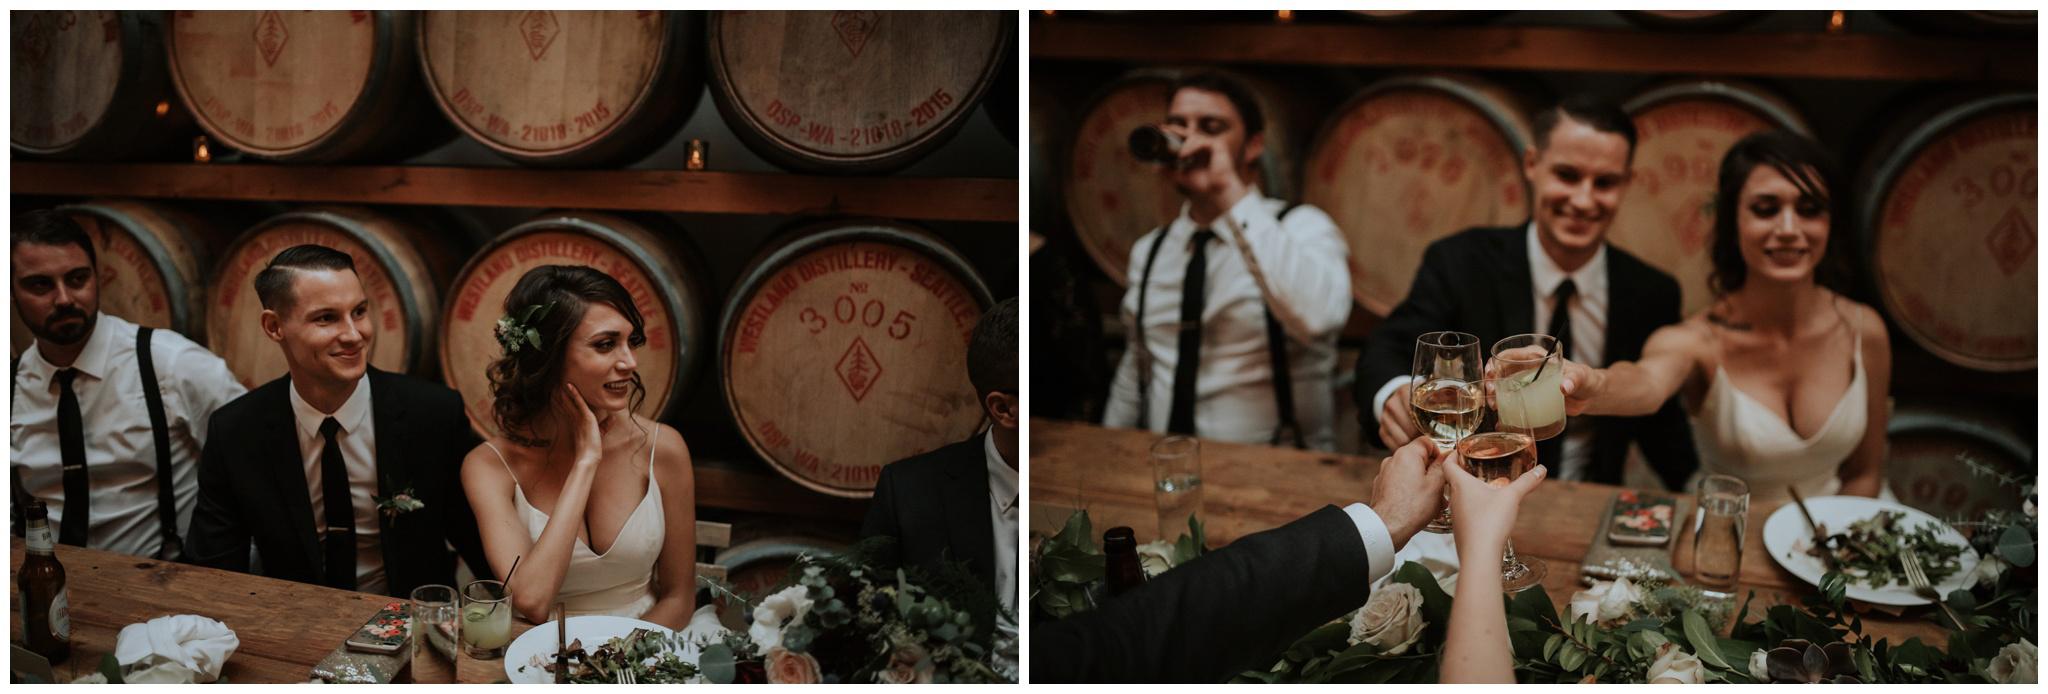 alyssa-keiran-westland-distillery-urban-seattle-wedding-photographer-caitlyn-nikula-138.jpg